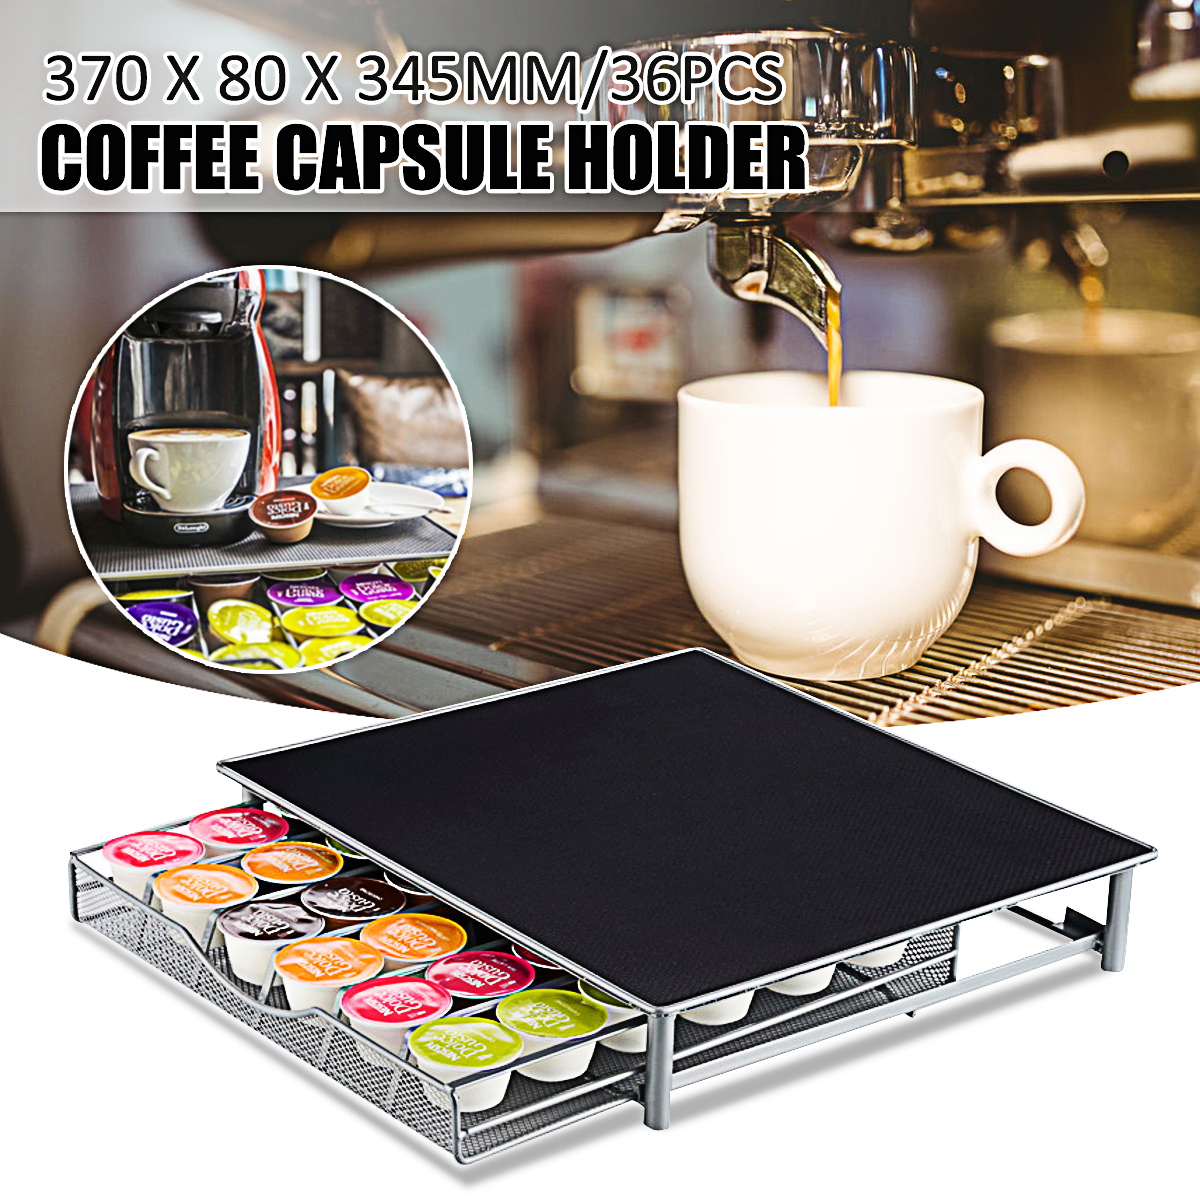 Rack Capsules Coffee Pod-Holder Storage-Stand Drawers Wire Nespresso Organization 370x80x345mm